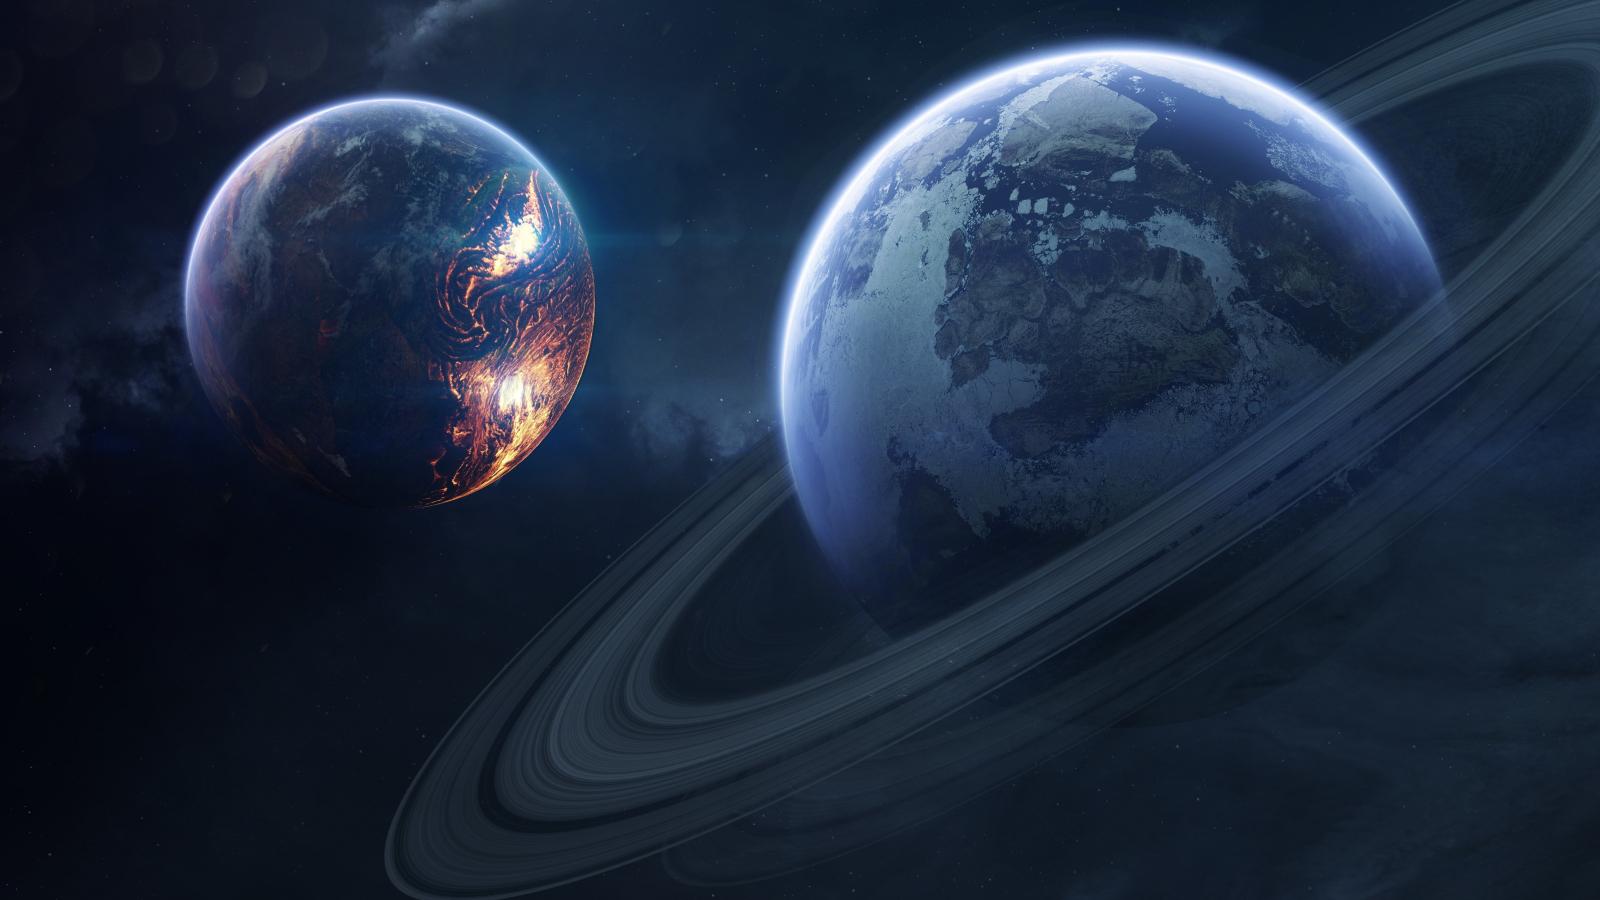 Saturn, space, planet of rings, 1600x900 wallpaper